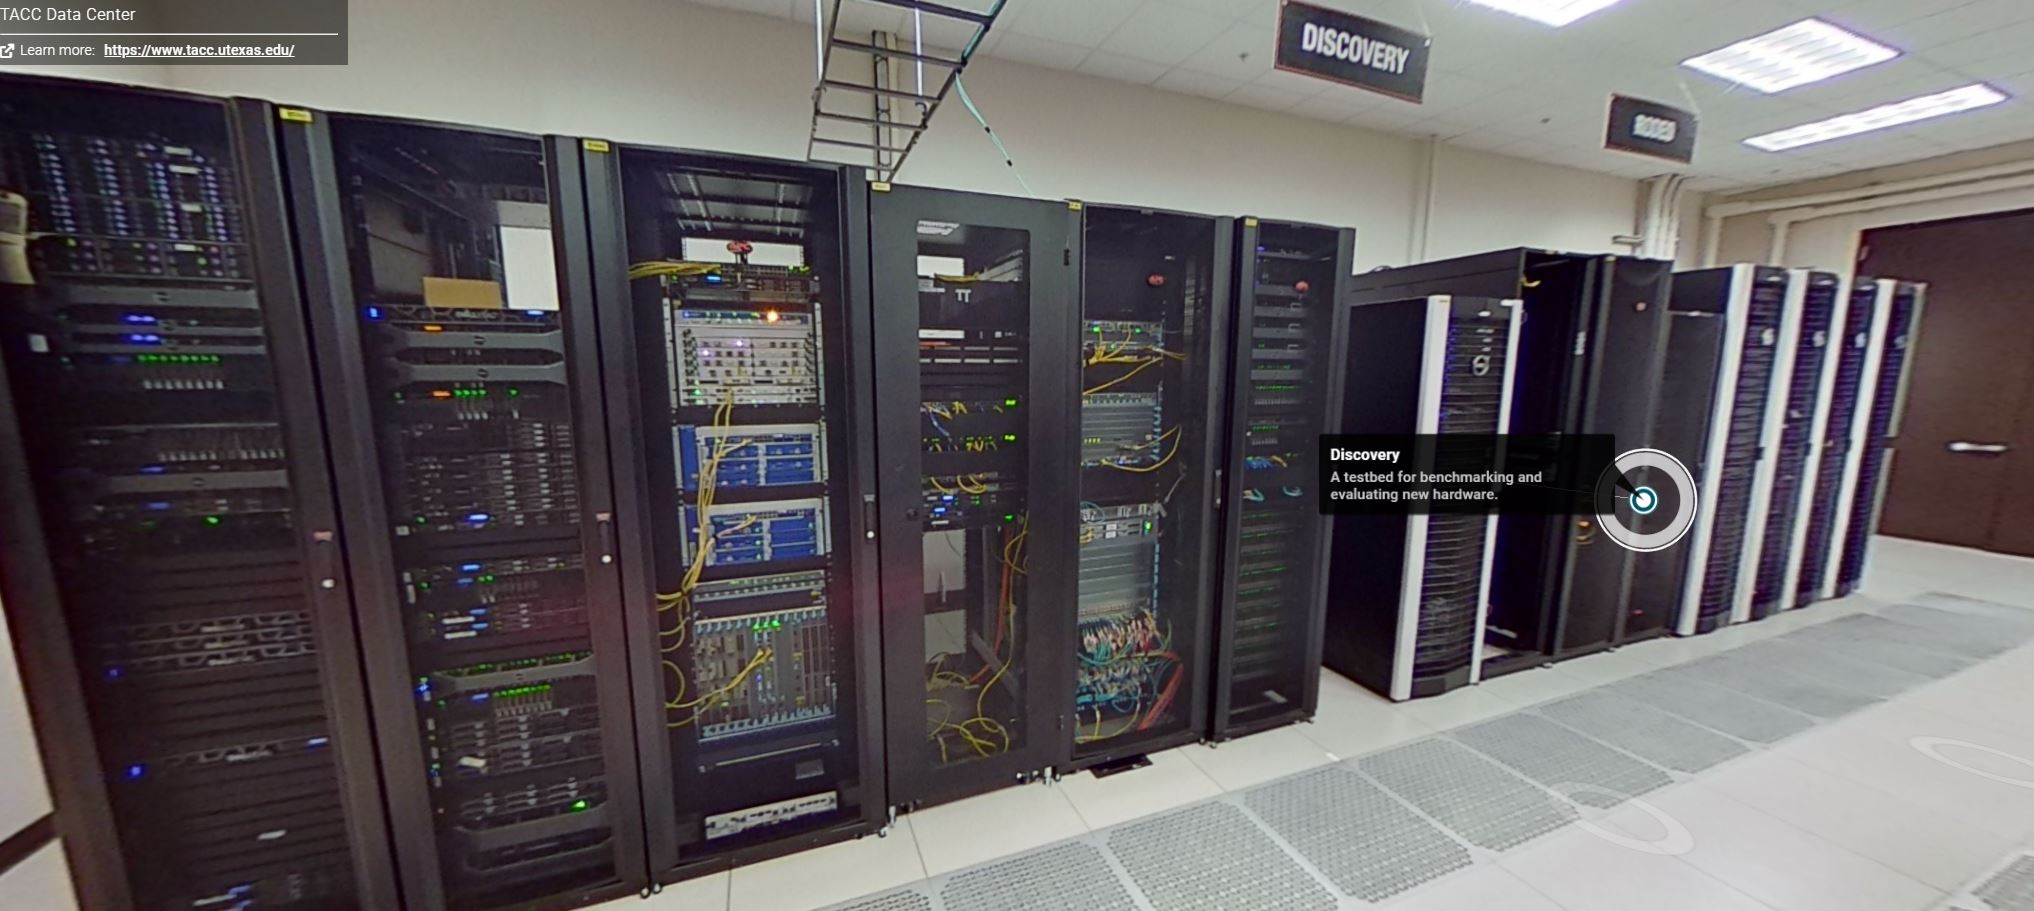 TACC Data Center Tour 2021 Matterport Discovery